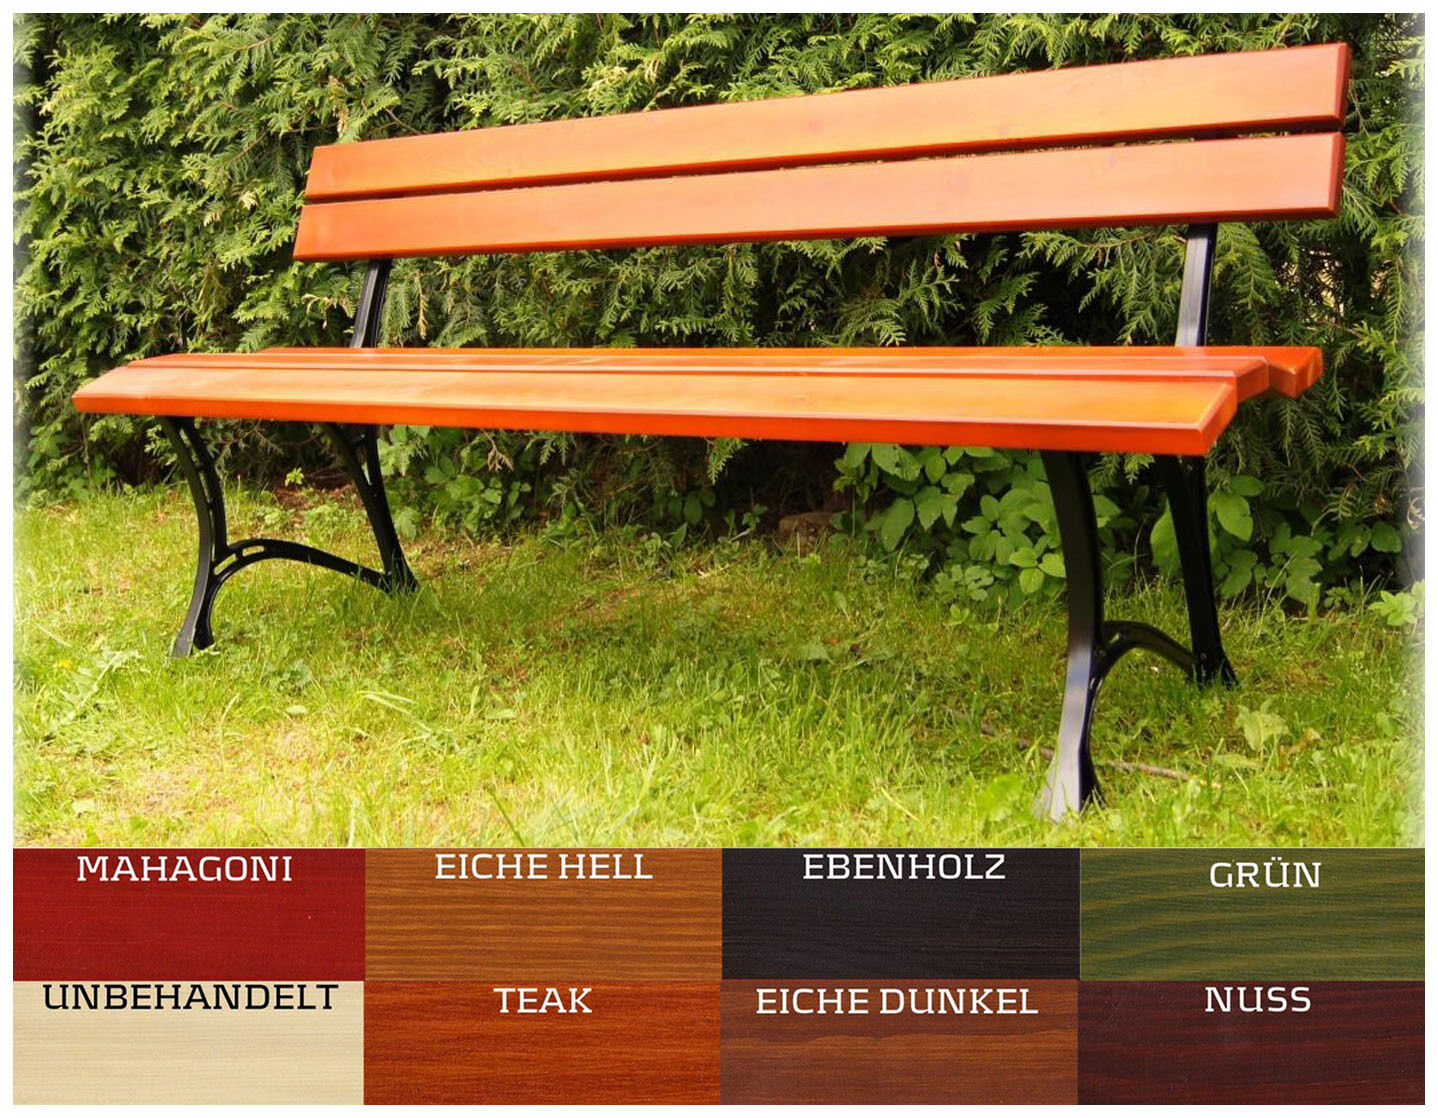 Gartenbank Sitzbank Gartenmöbel Holzbank Parkbank TEAK NUSS 160 cm Hersteller